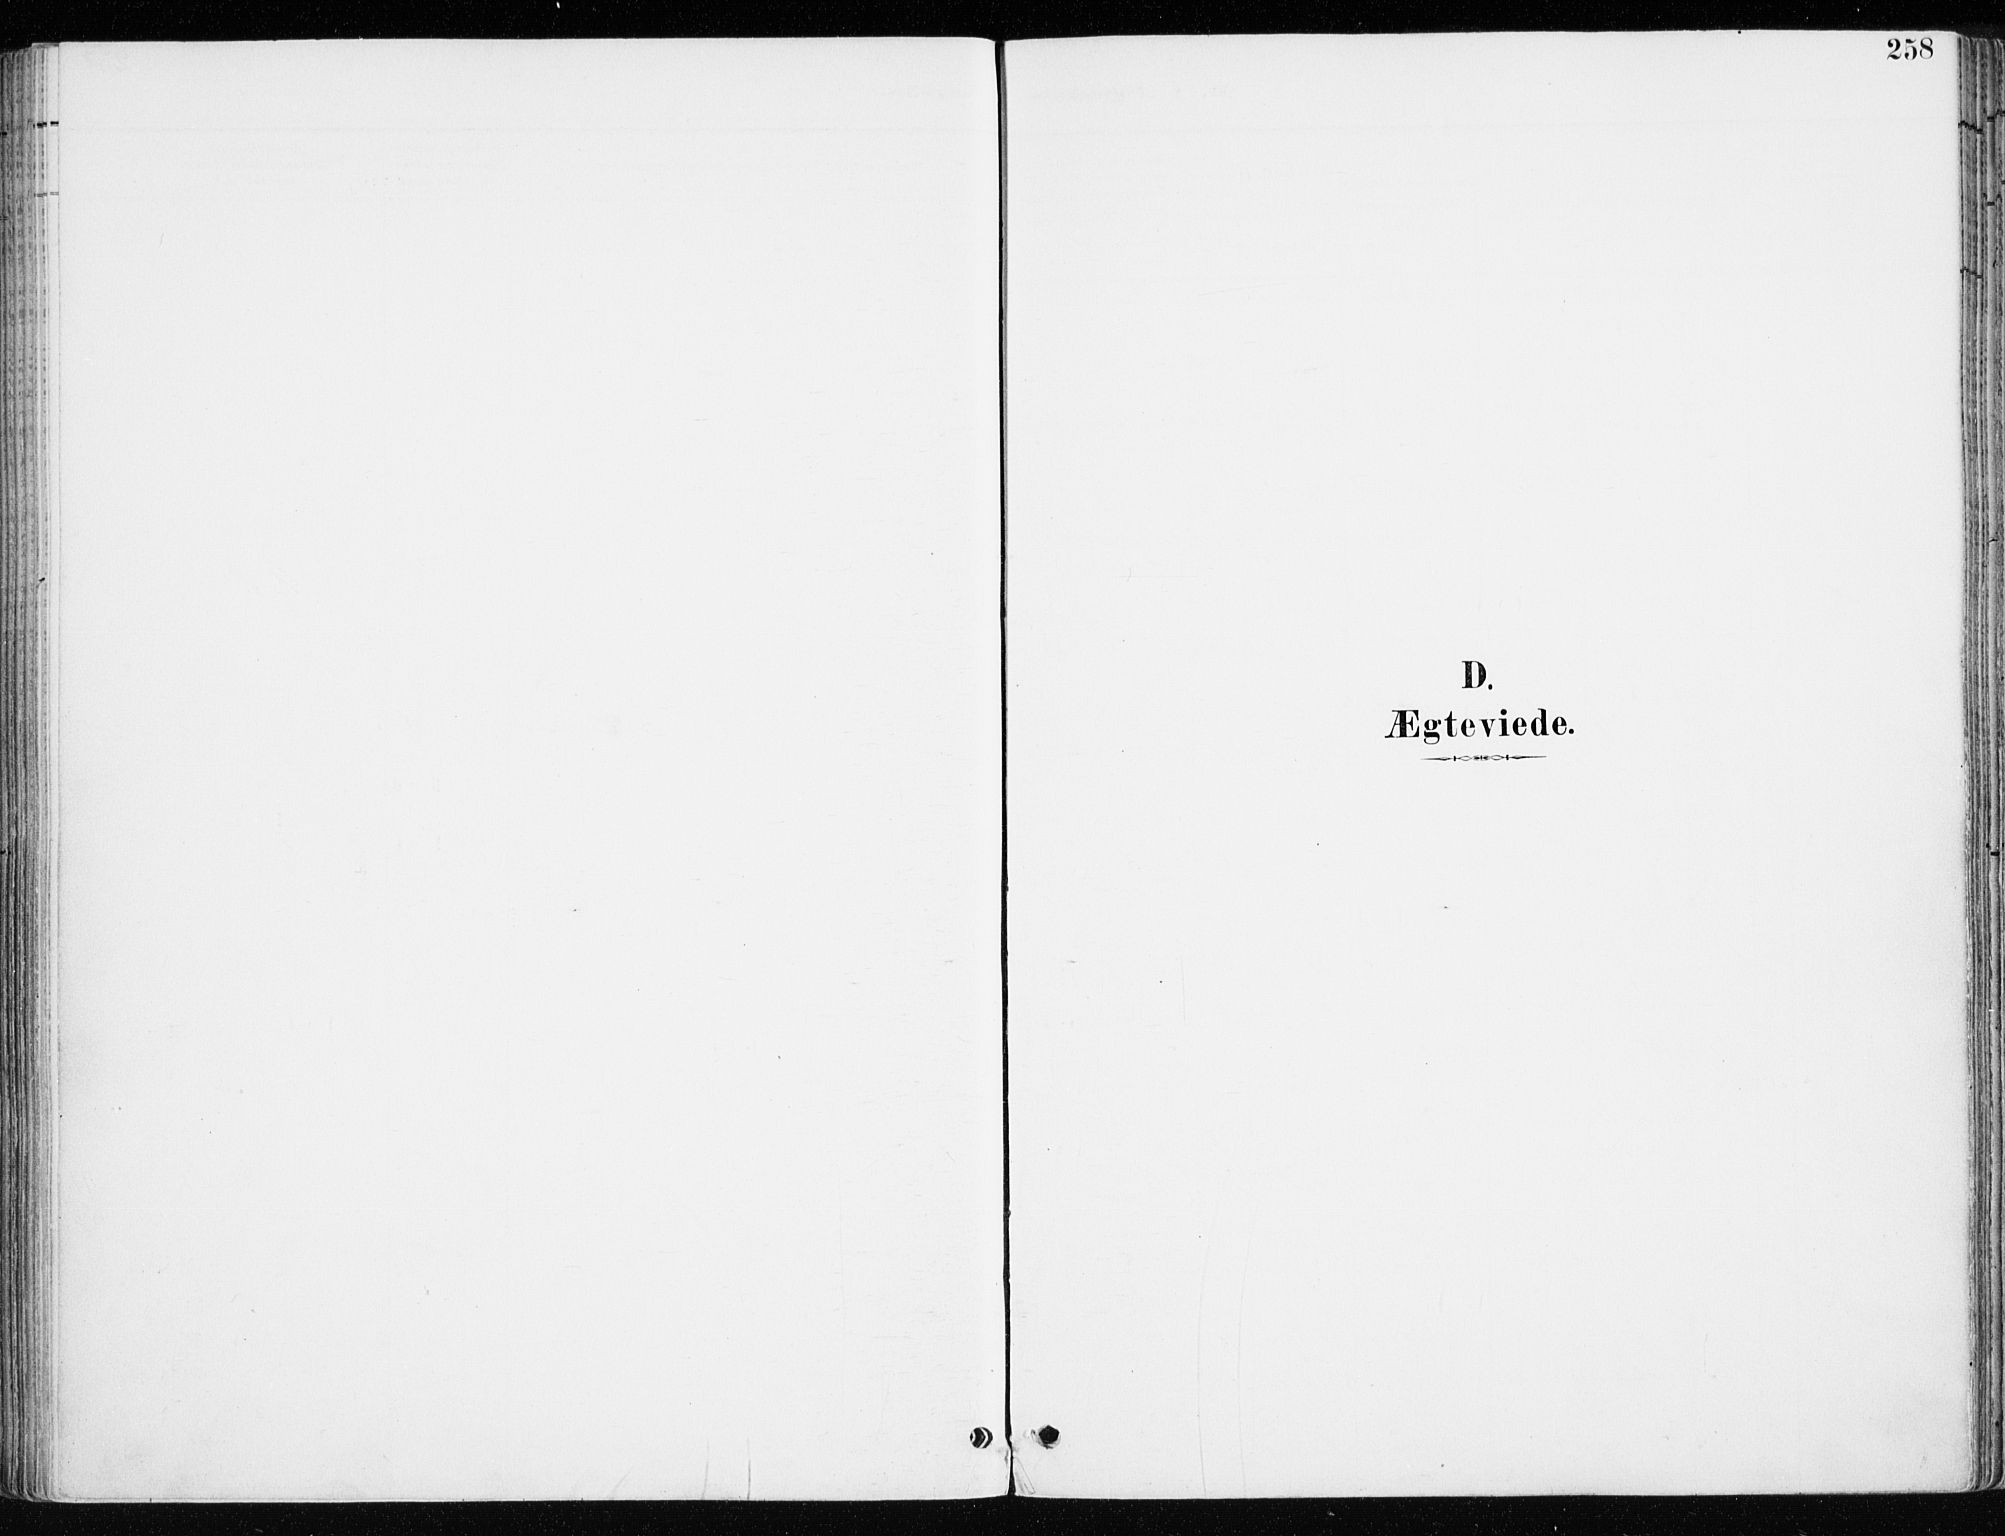 SAH, Løten prestekontor, K/Ka/L0010: Ministerialbok nr. 10, 1892-1907, s. 258